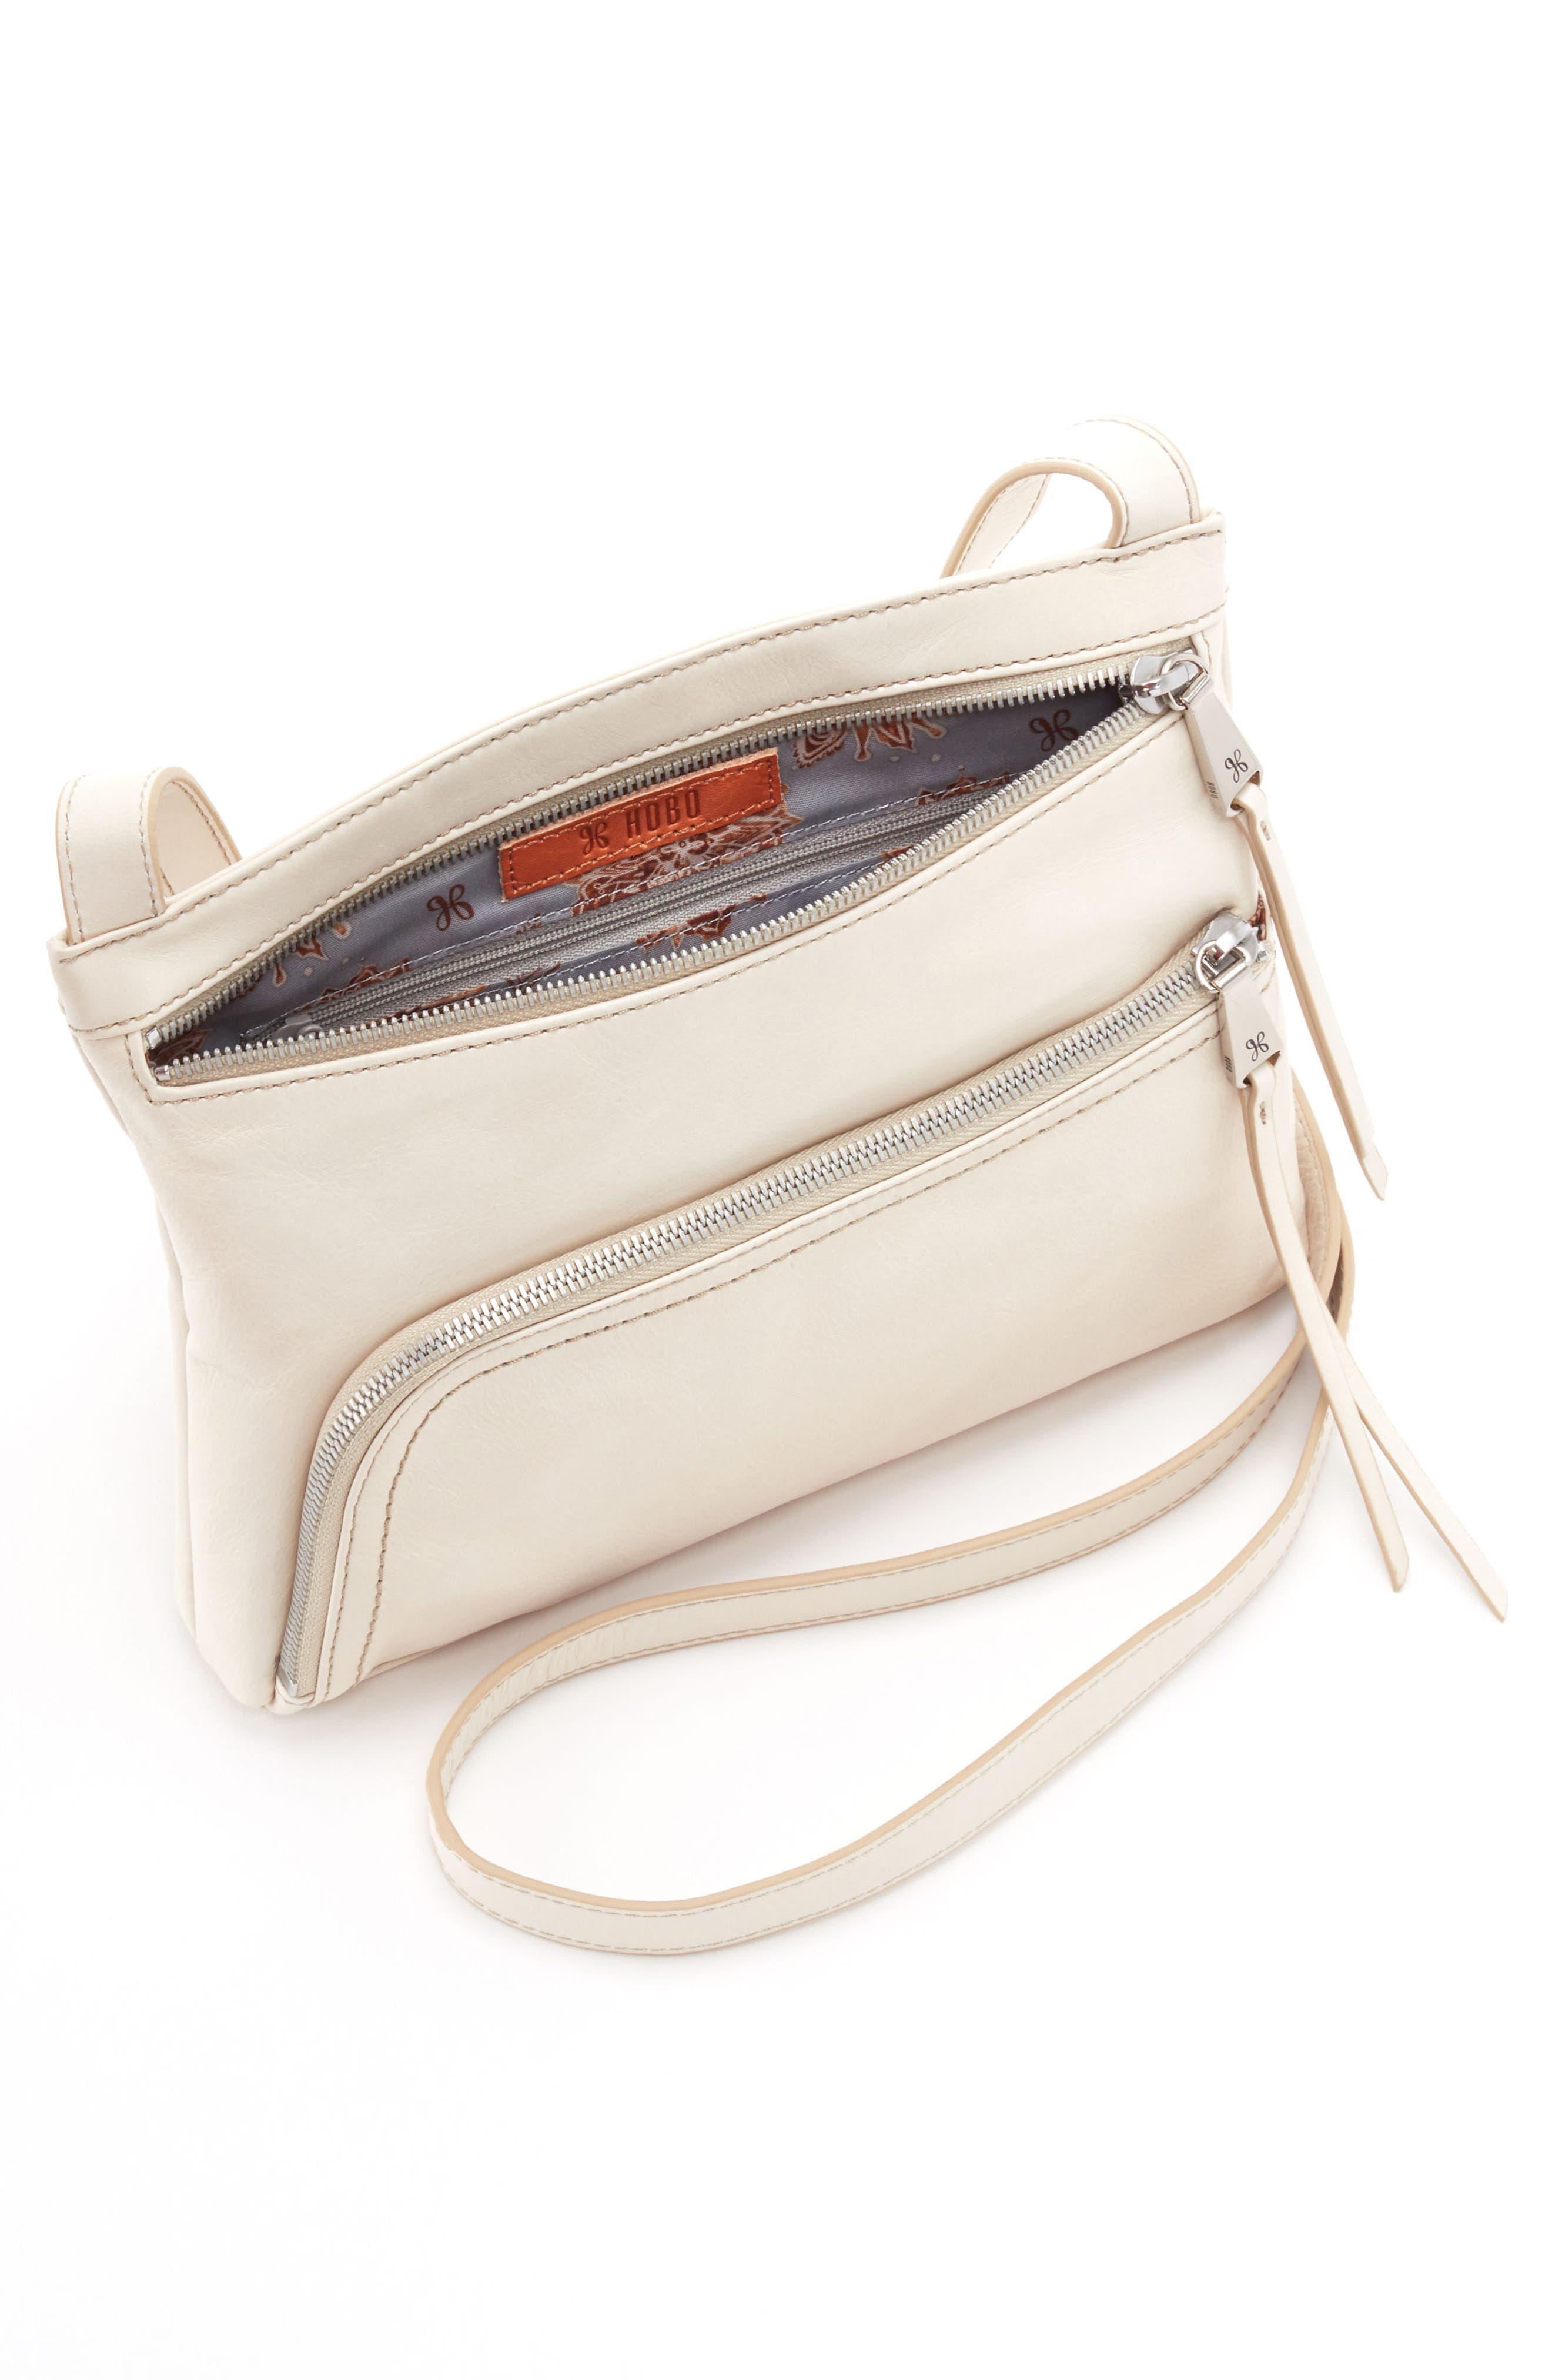 'Cassie' Crossbody Bag,                             Alternate thumbnail 3, color,                             120